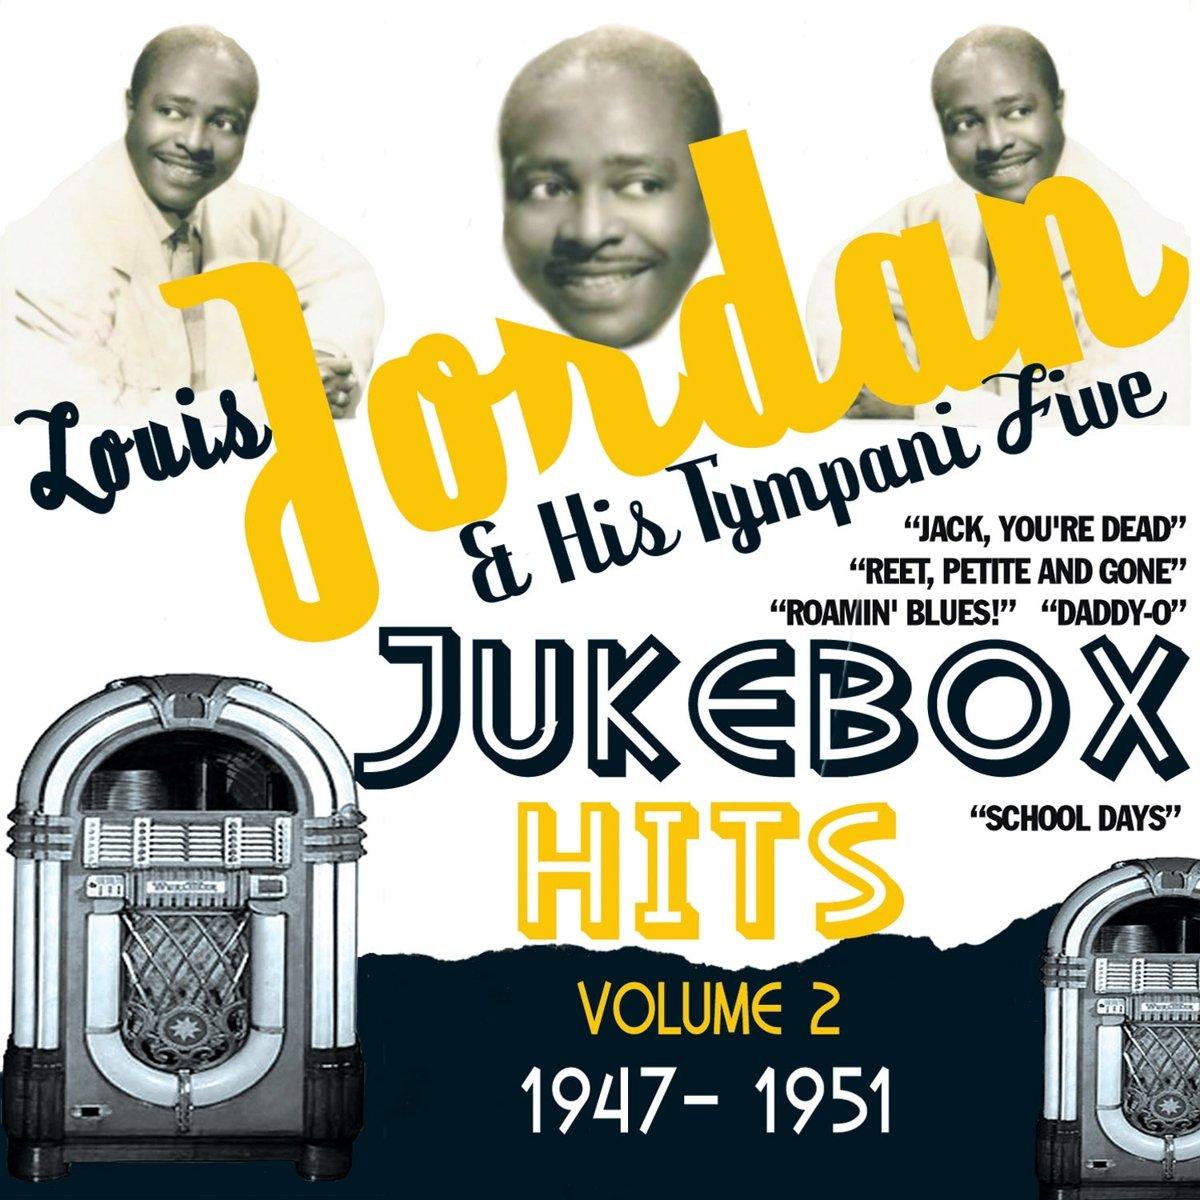 Jukebox Hits Vol 2 1947-1951